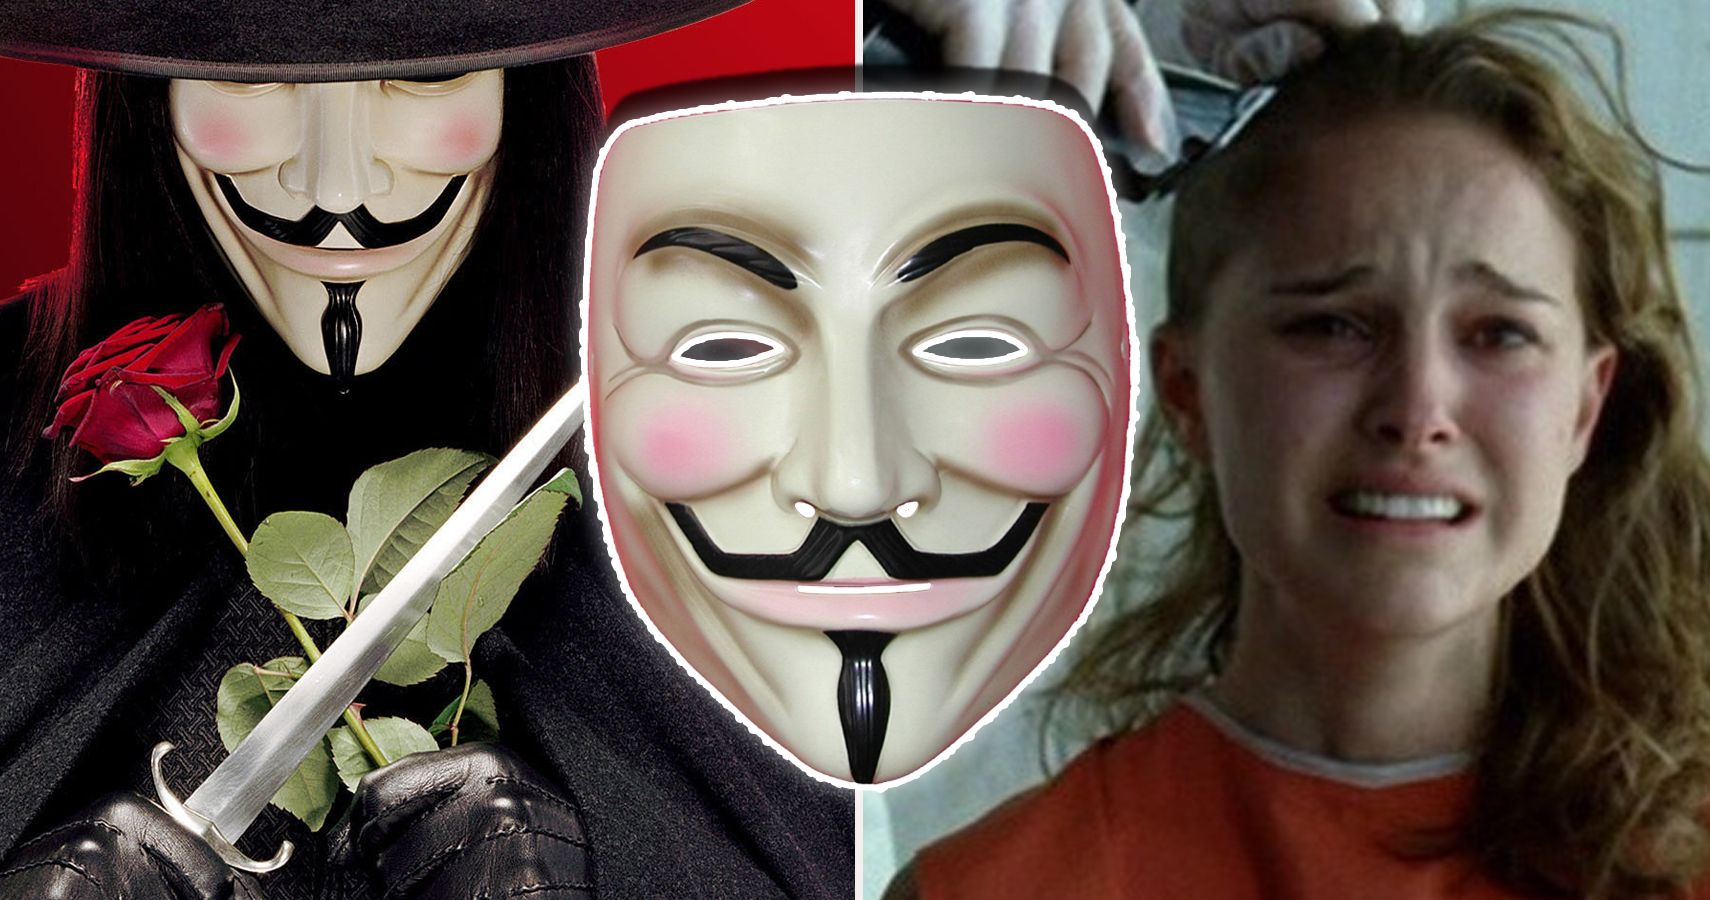 25 Secrets About V For Vendetta That Make Us Put On The Mask